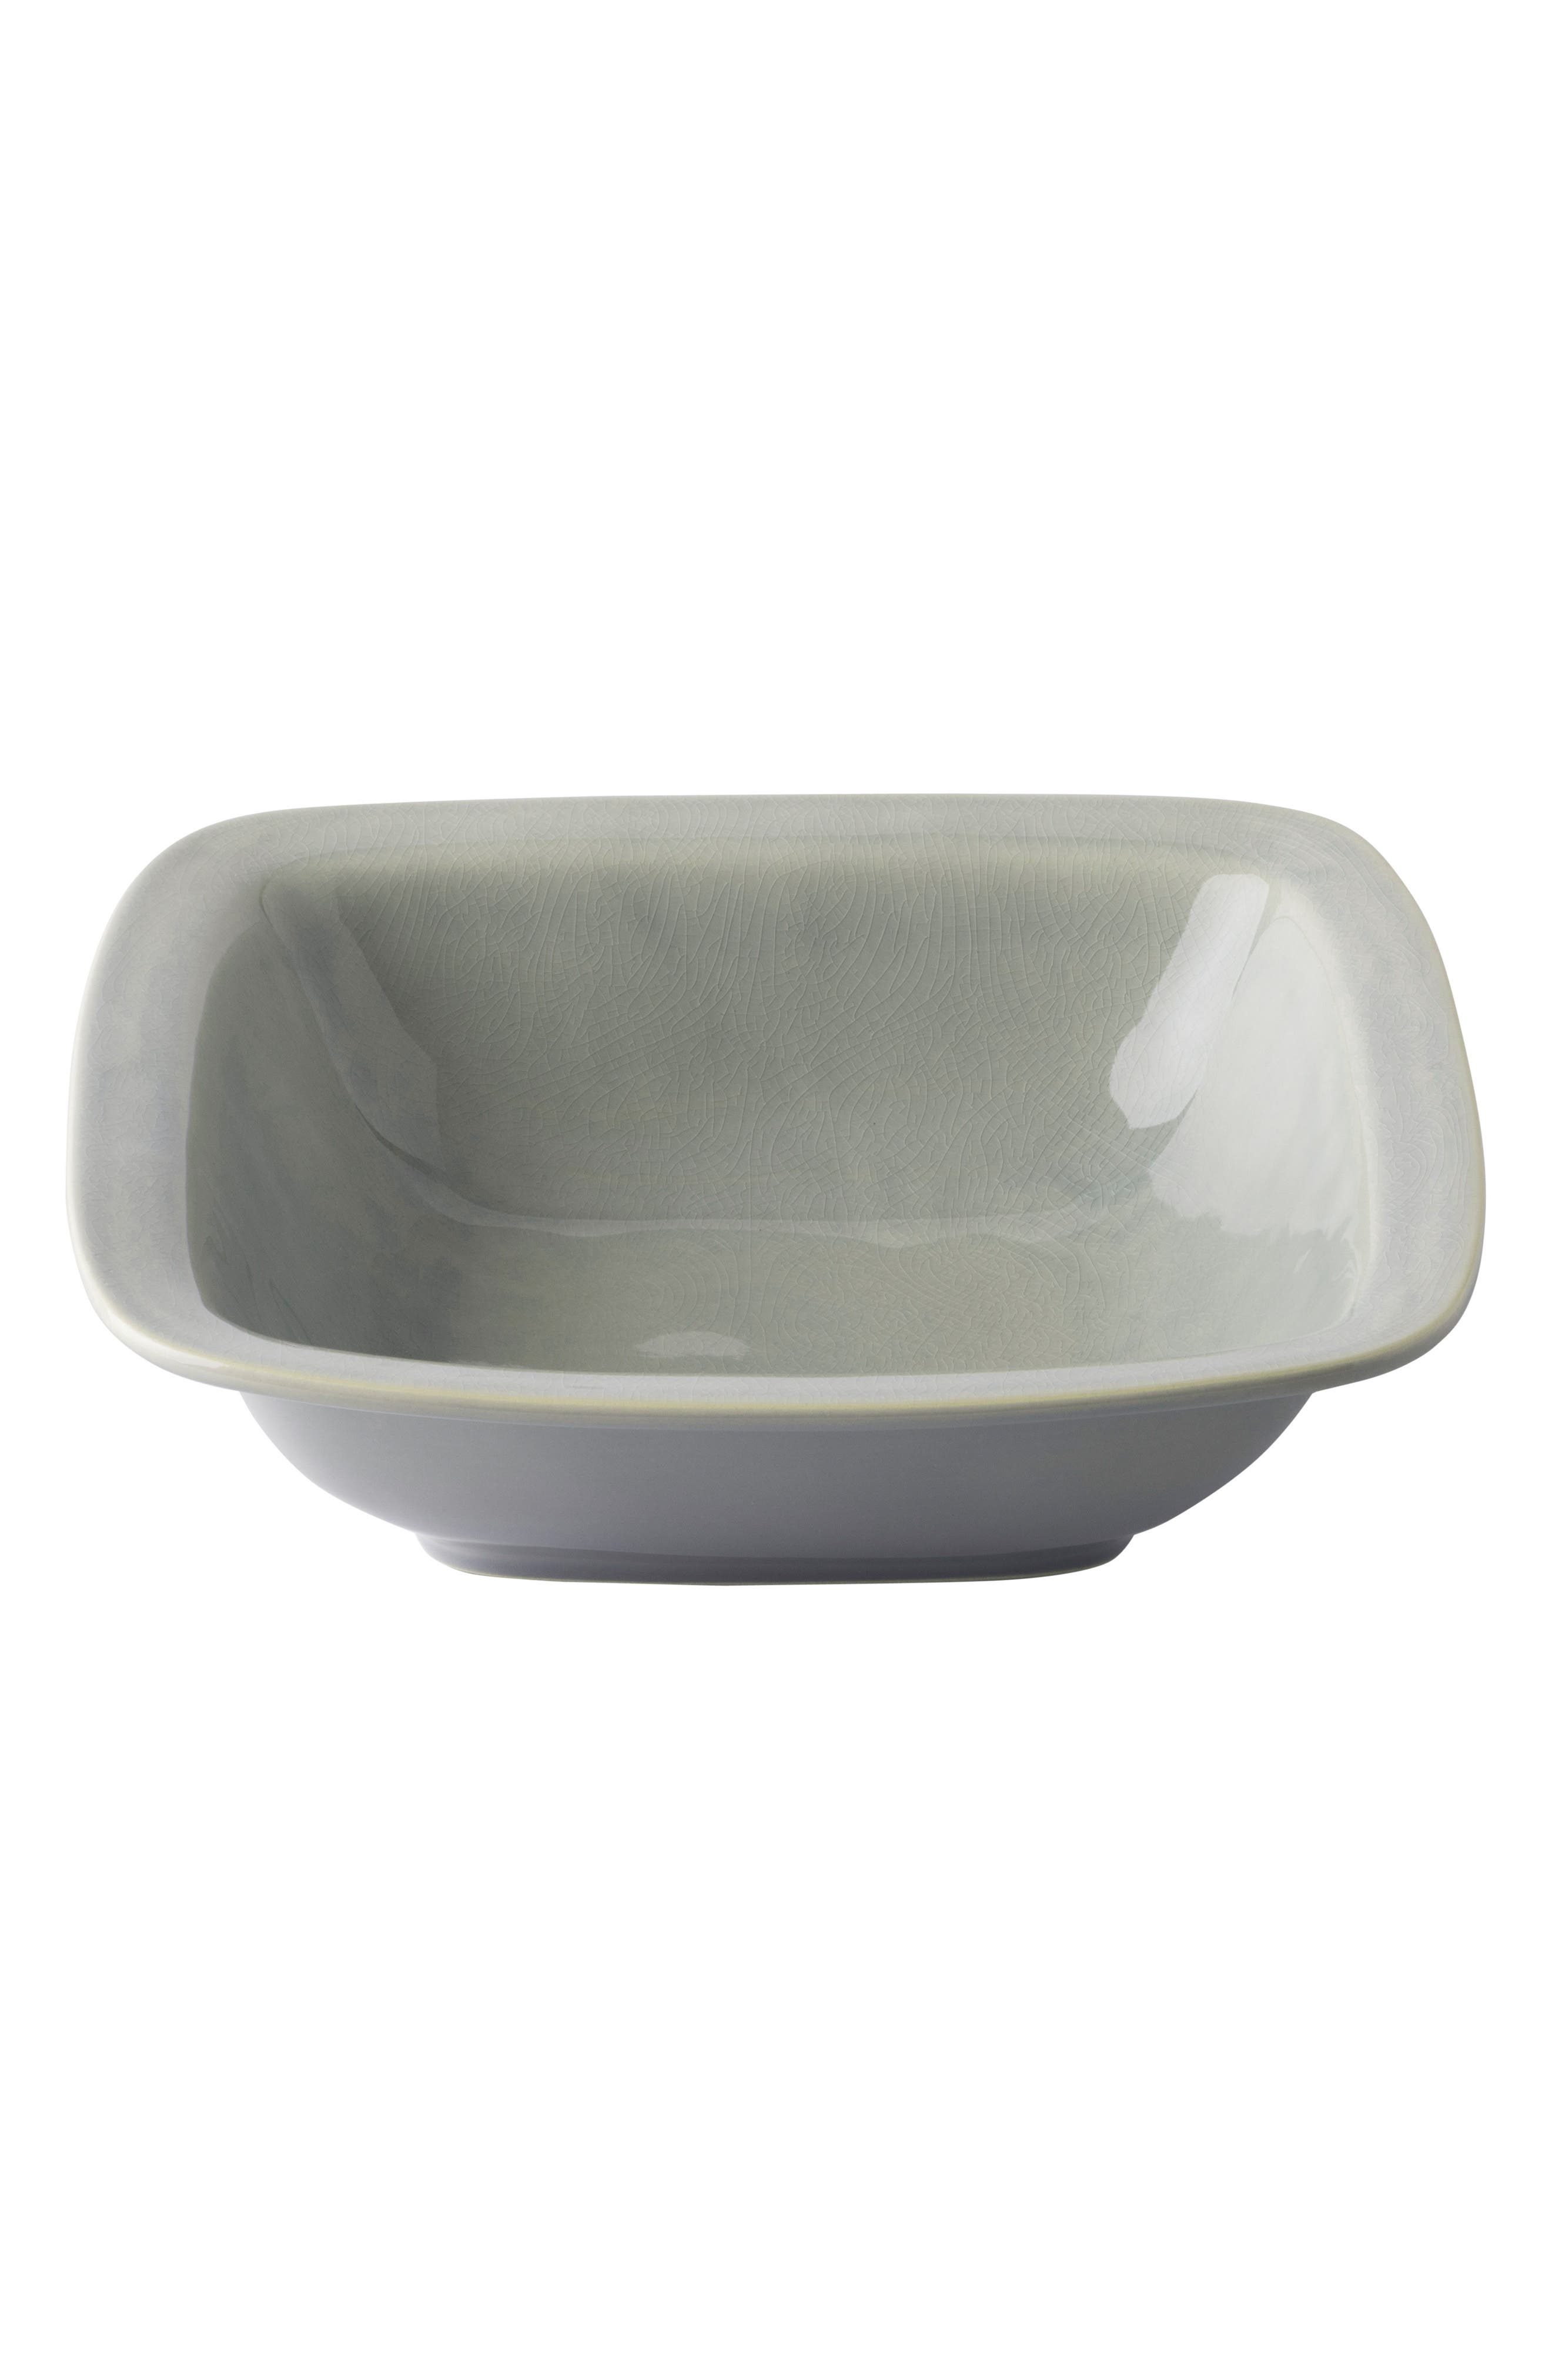 Puro Large Ceramic Serving Bowl,                             Main thumbnail 1, color,                             MIST GREY CRACKLE